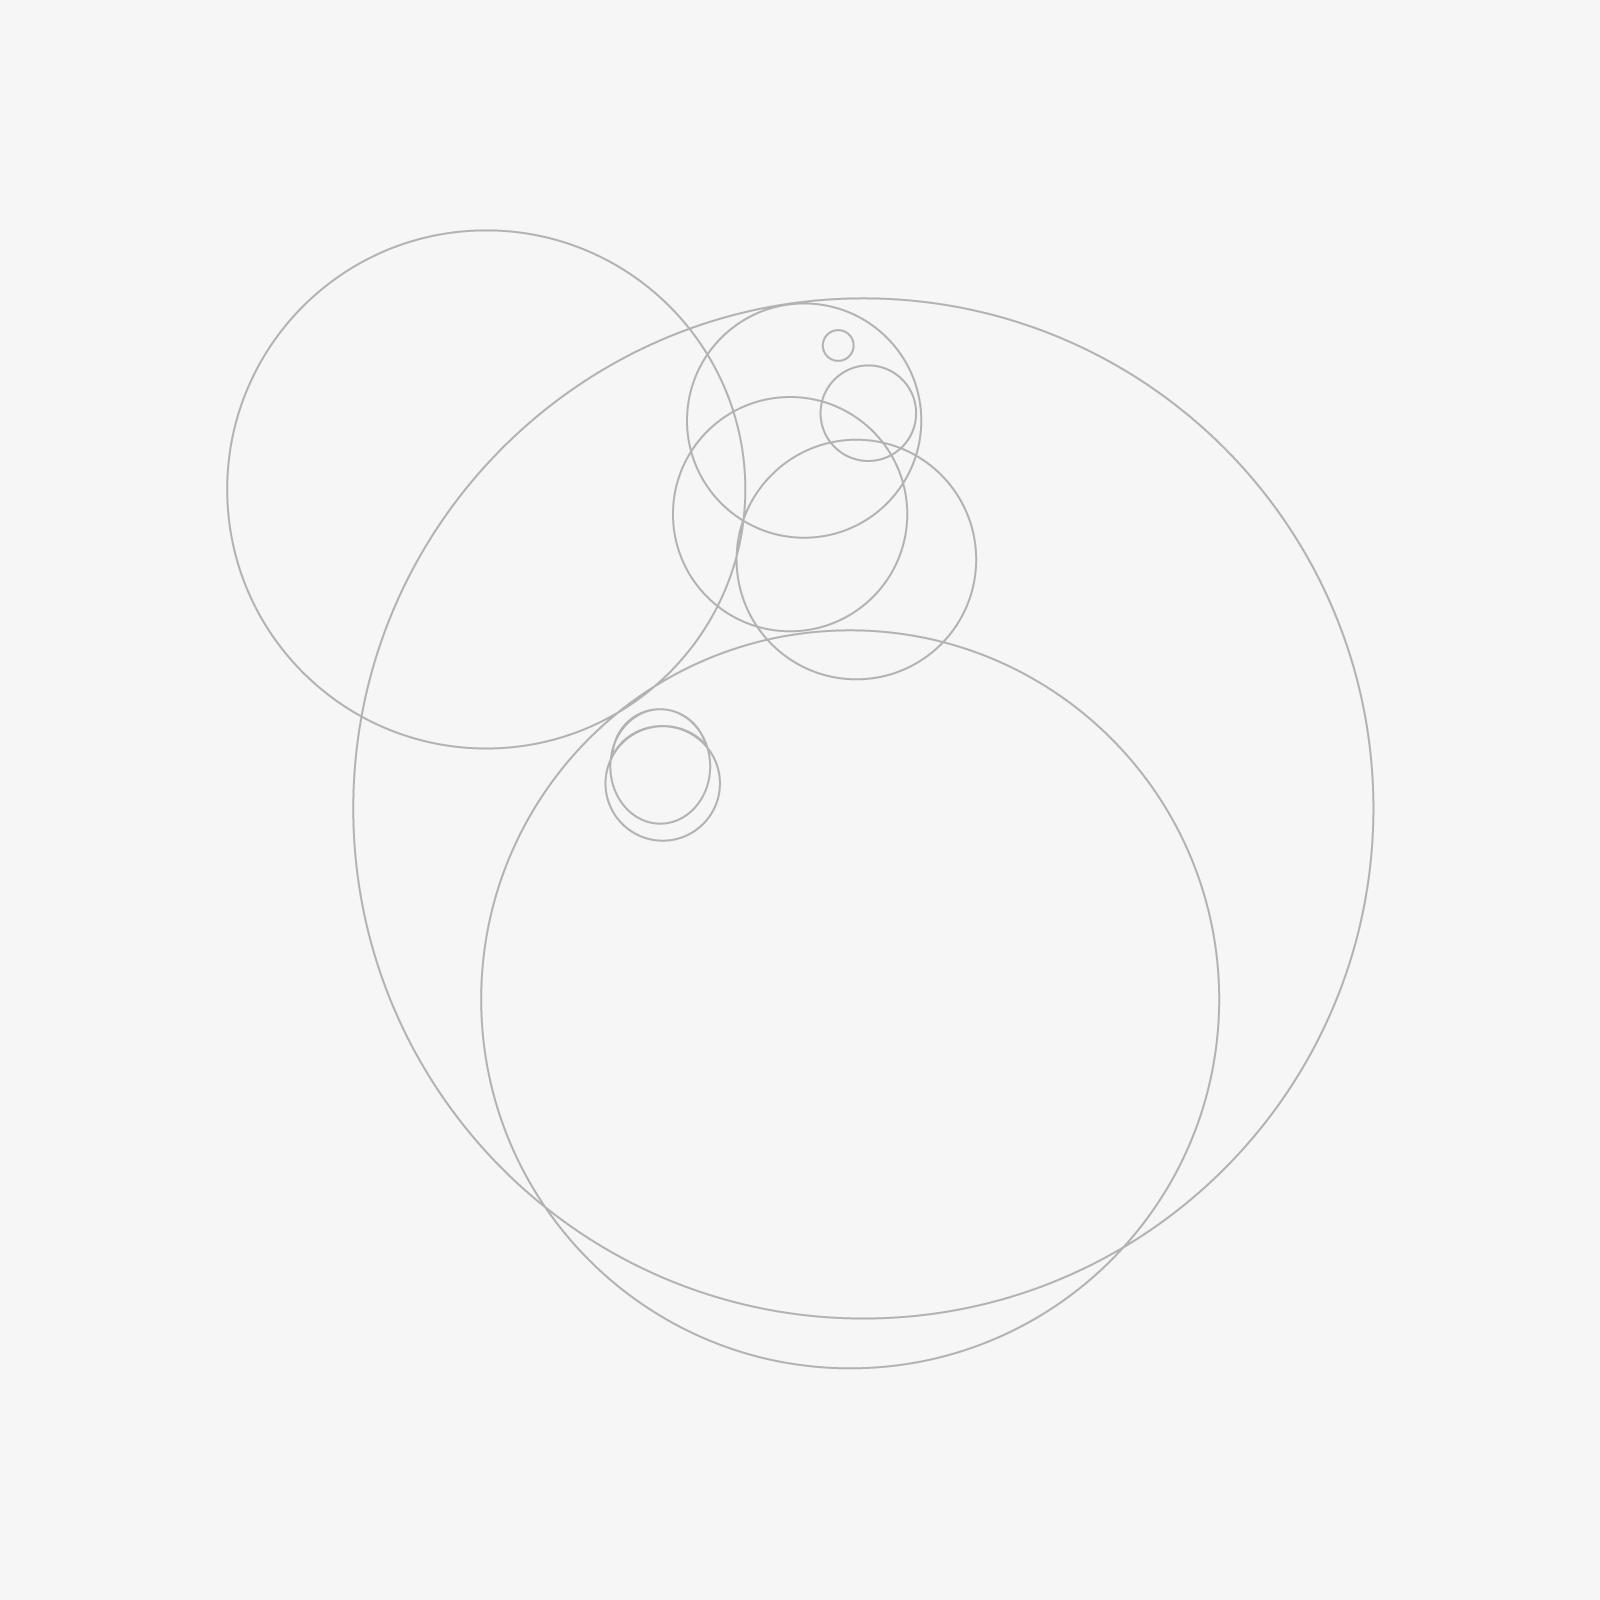 https://www.orlandinifrancesco.com/wp/wp-content/uploads/2019/01/Logo-Pappagallo-1-1.jpg